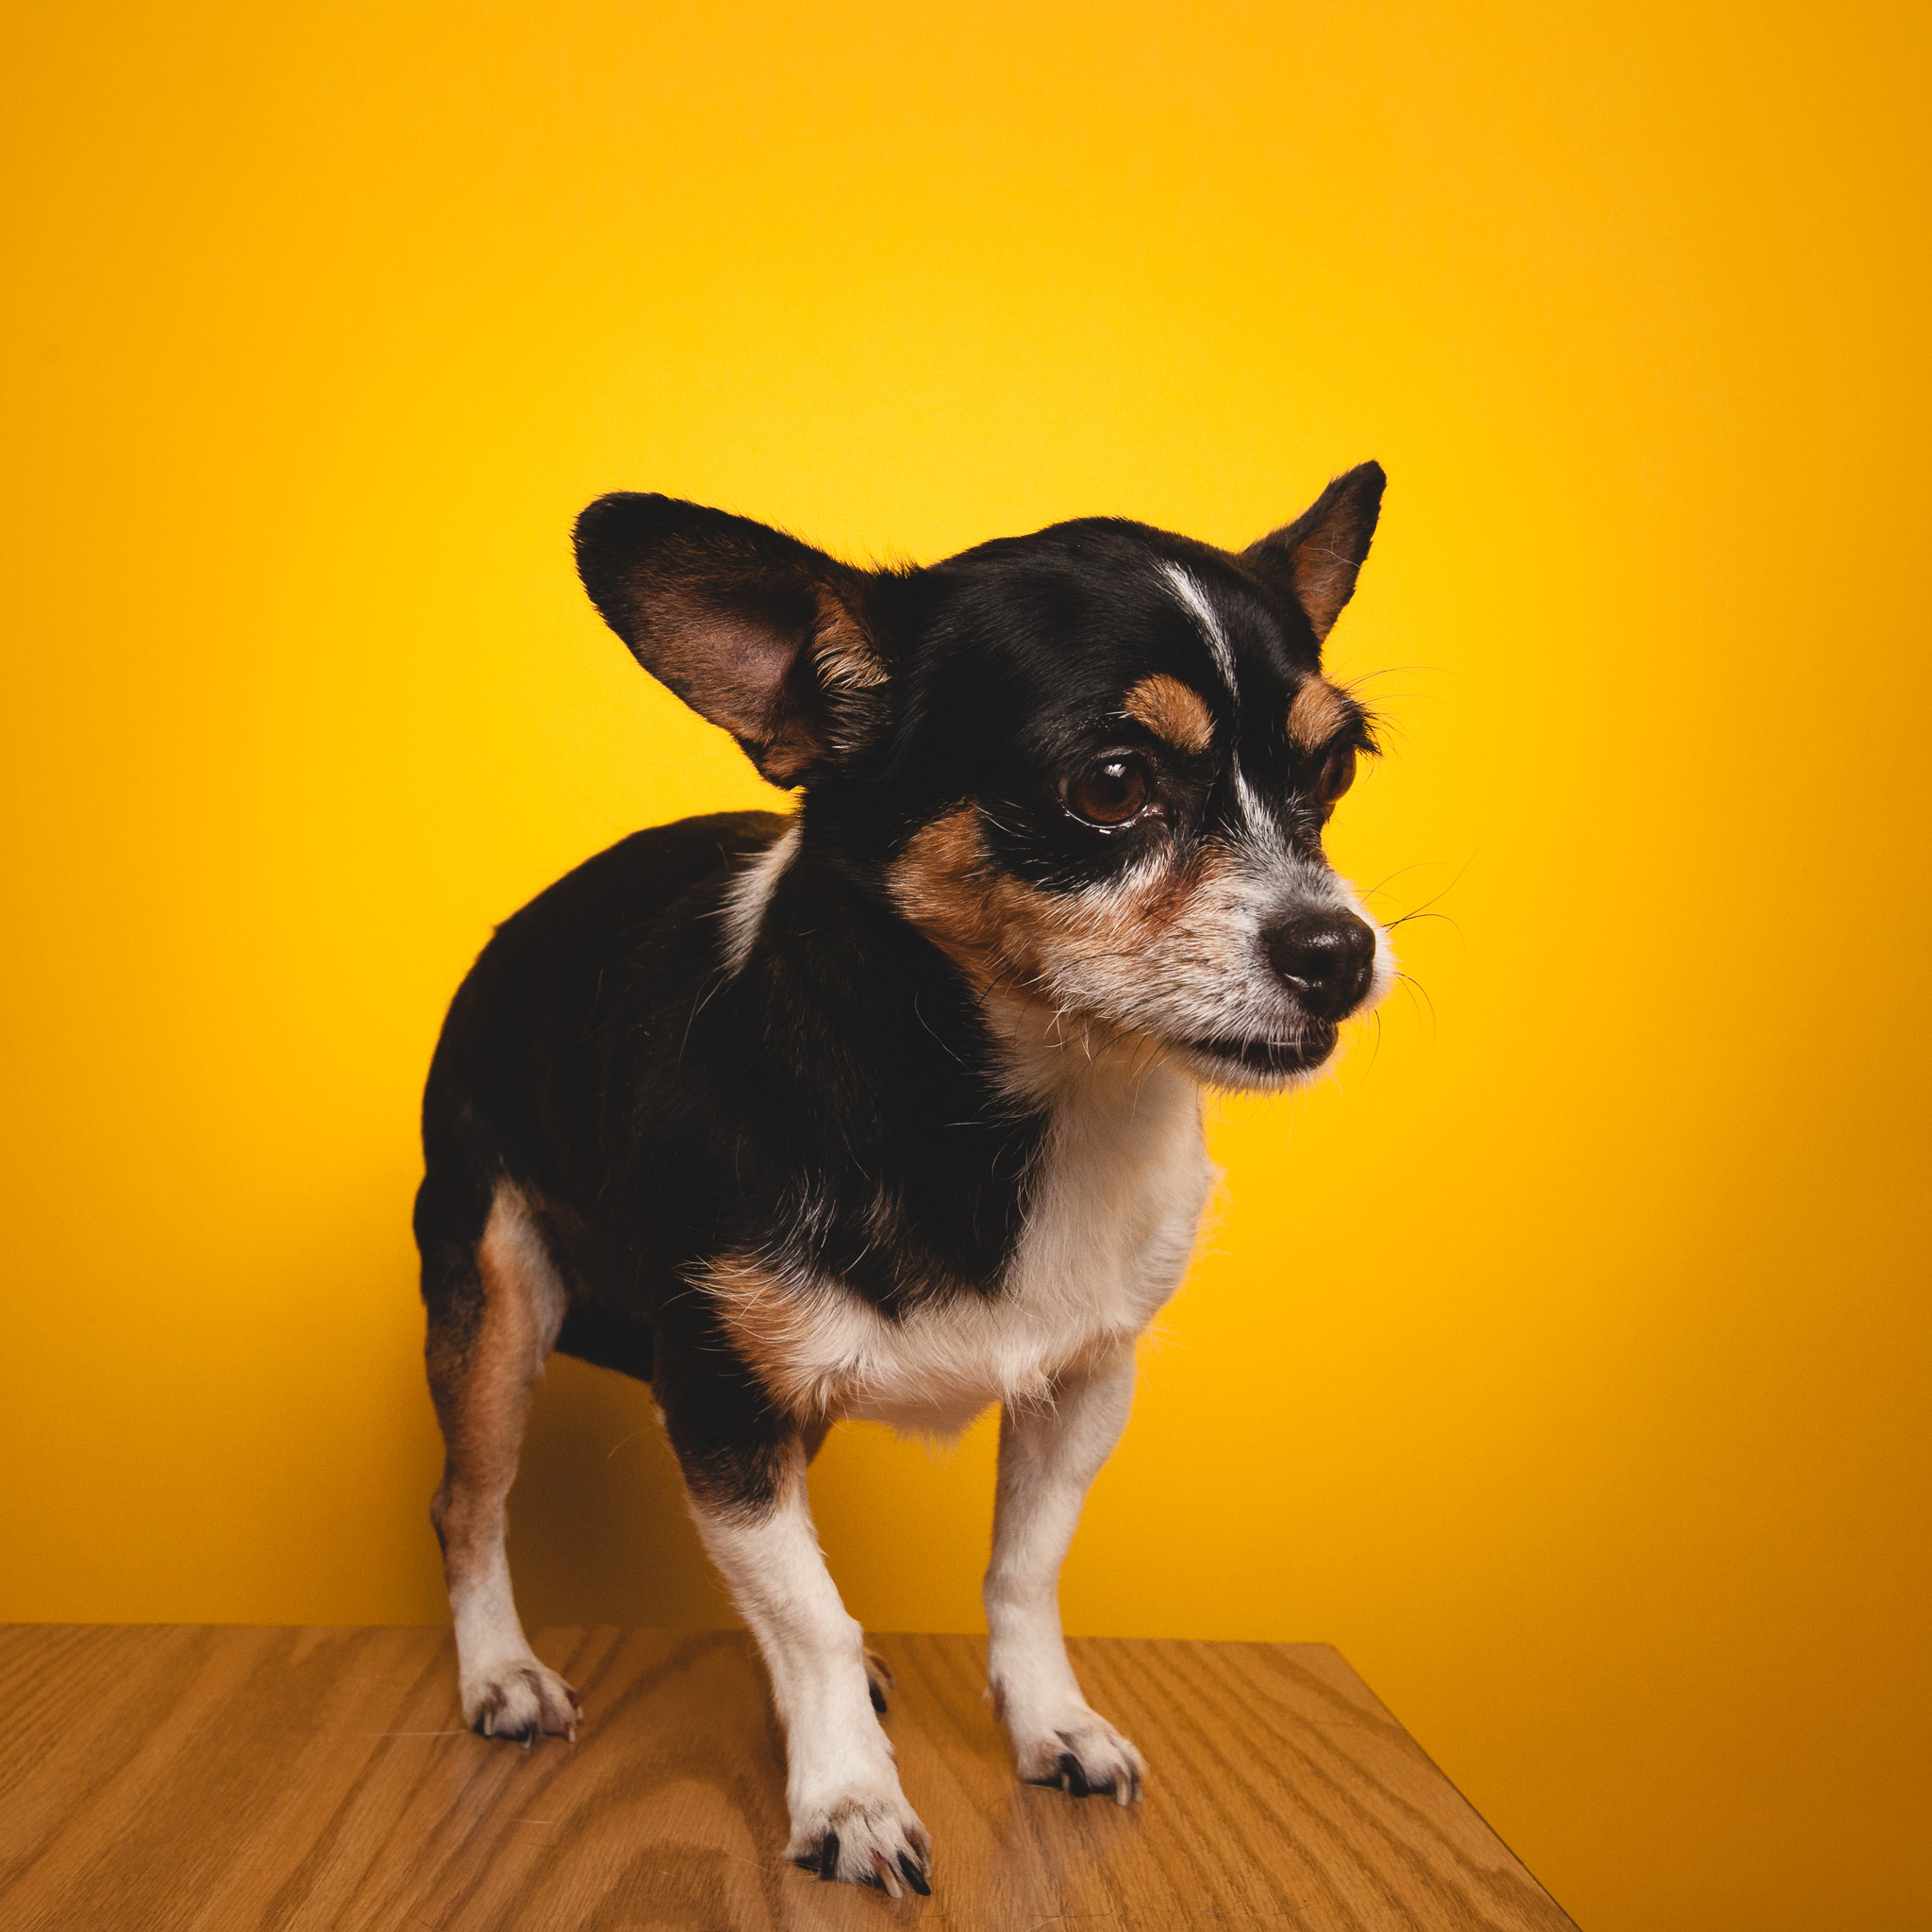 Chihuahua, PAWS Chicago